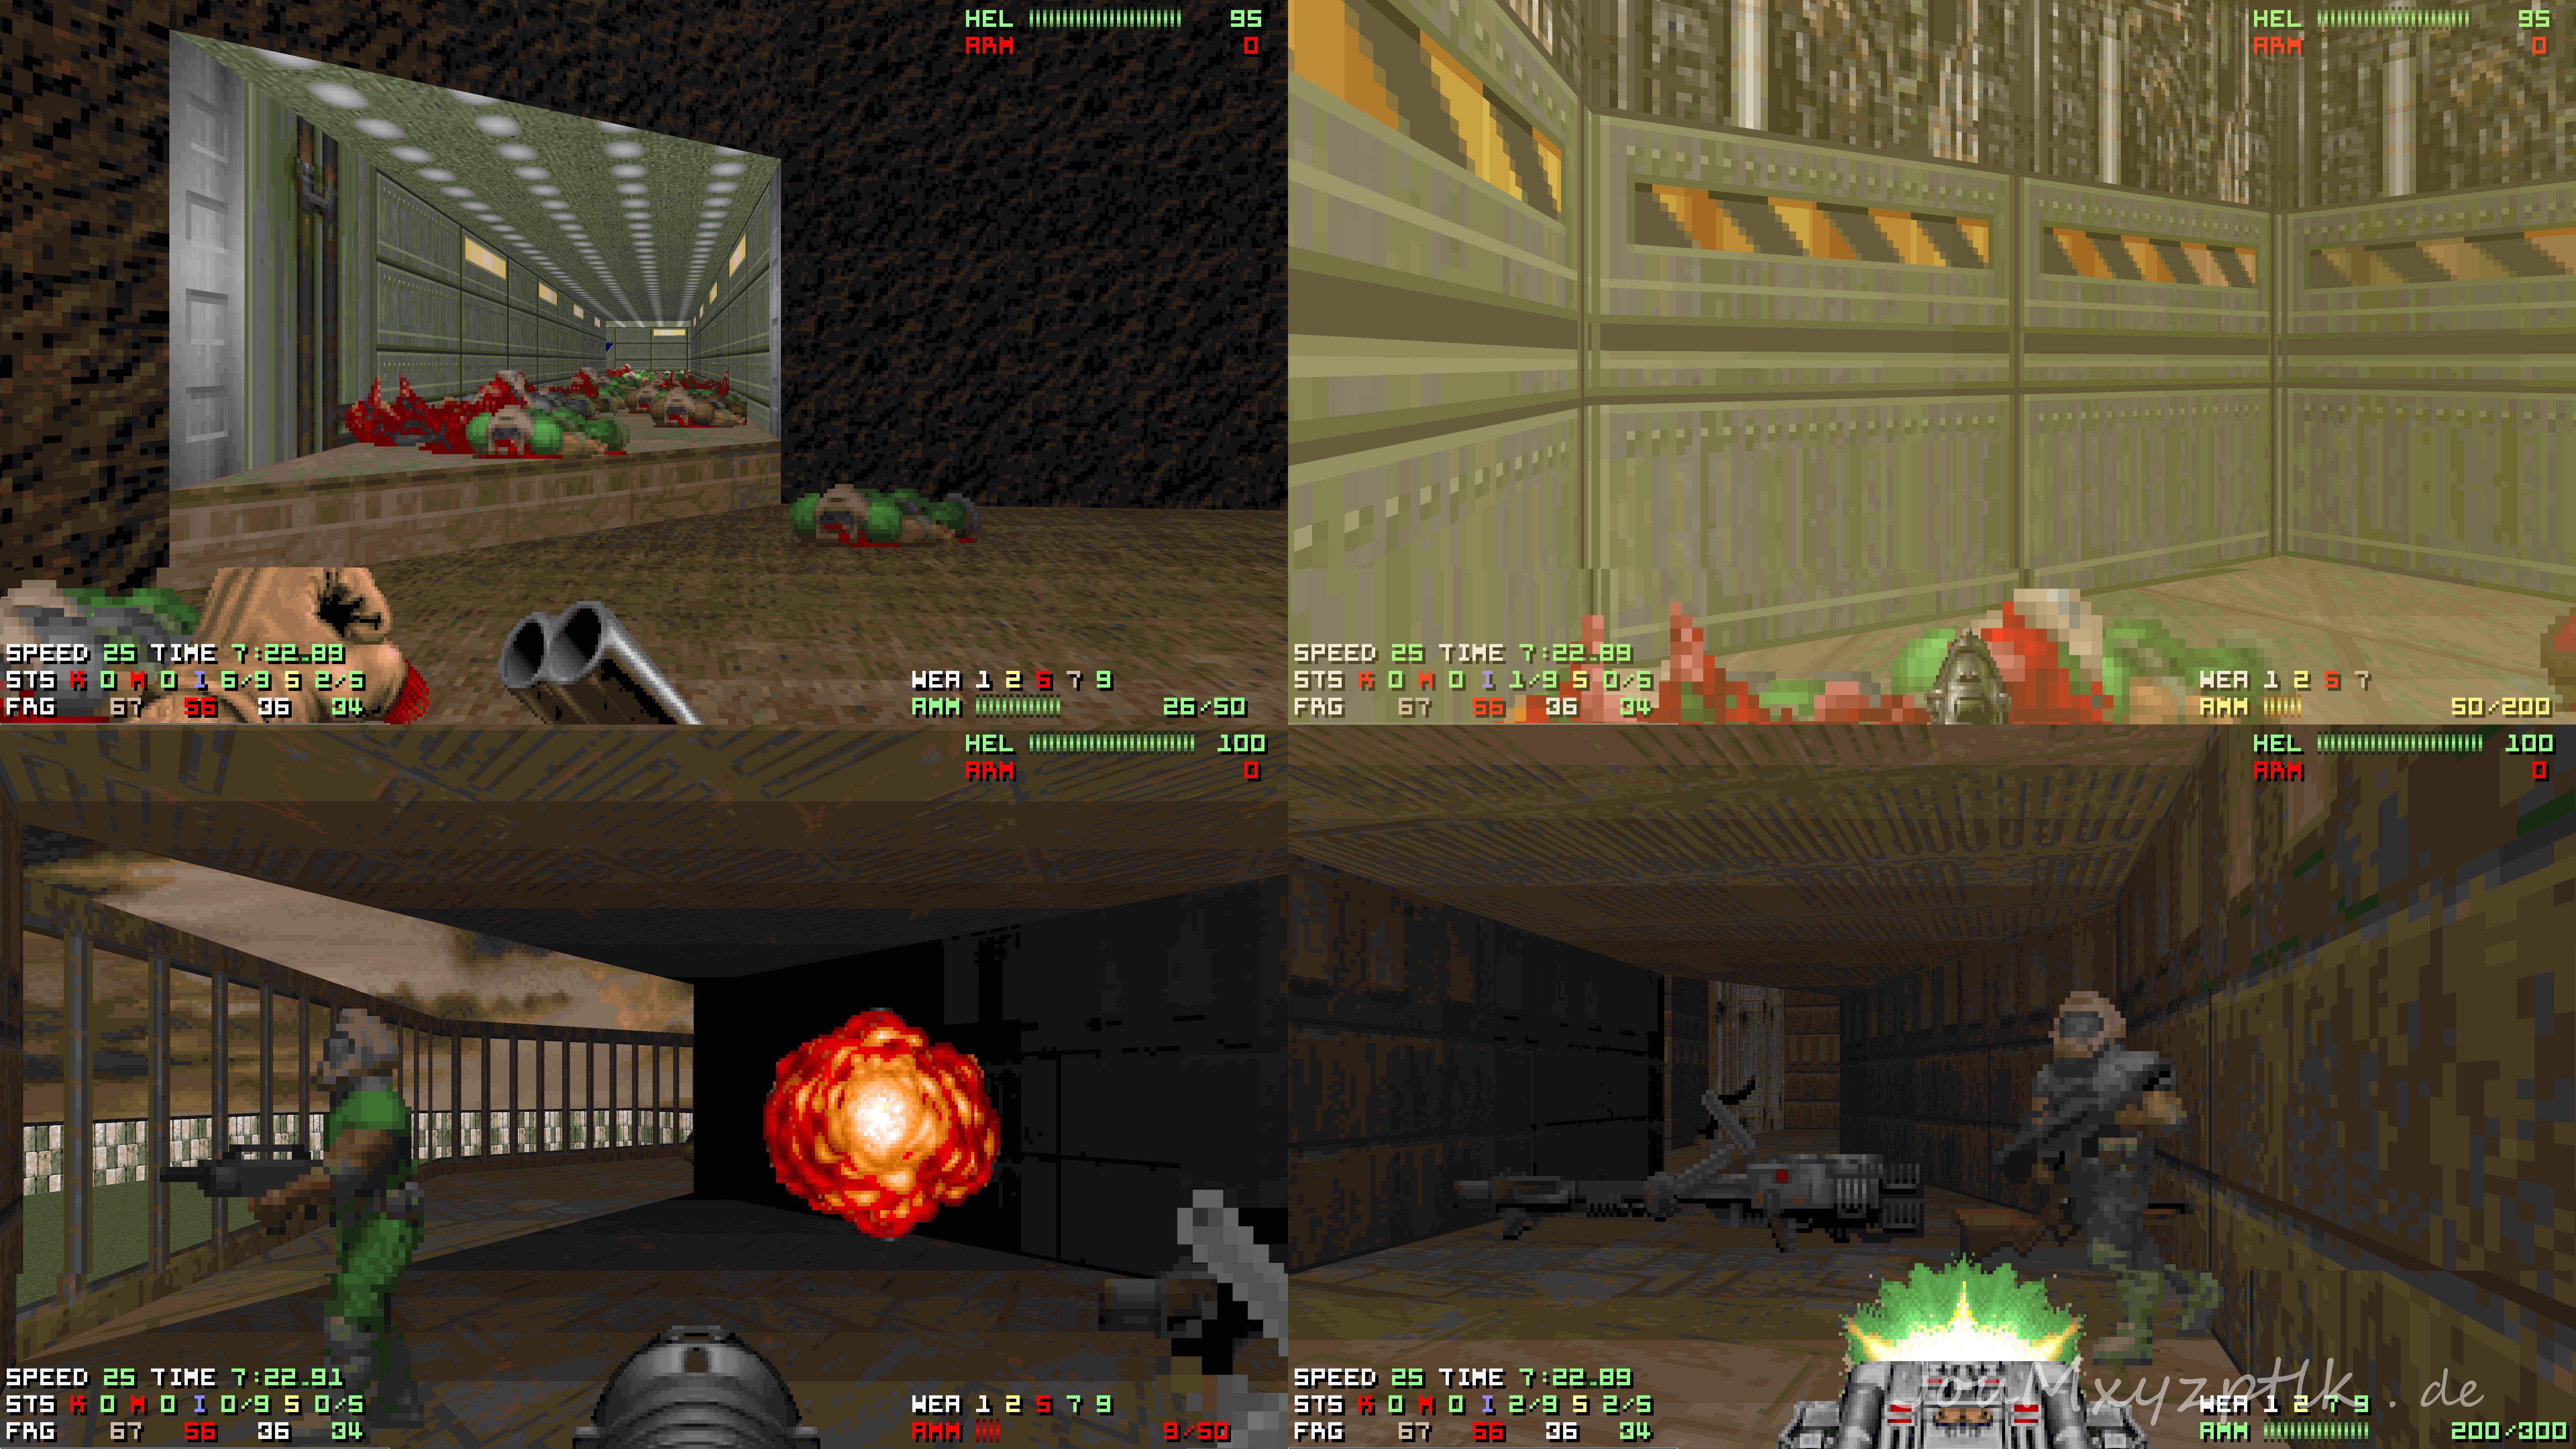 JouMxyzptlk - Doom 2 deathmatch 4 player split screen in 8k 120 fps